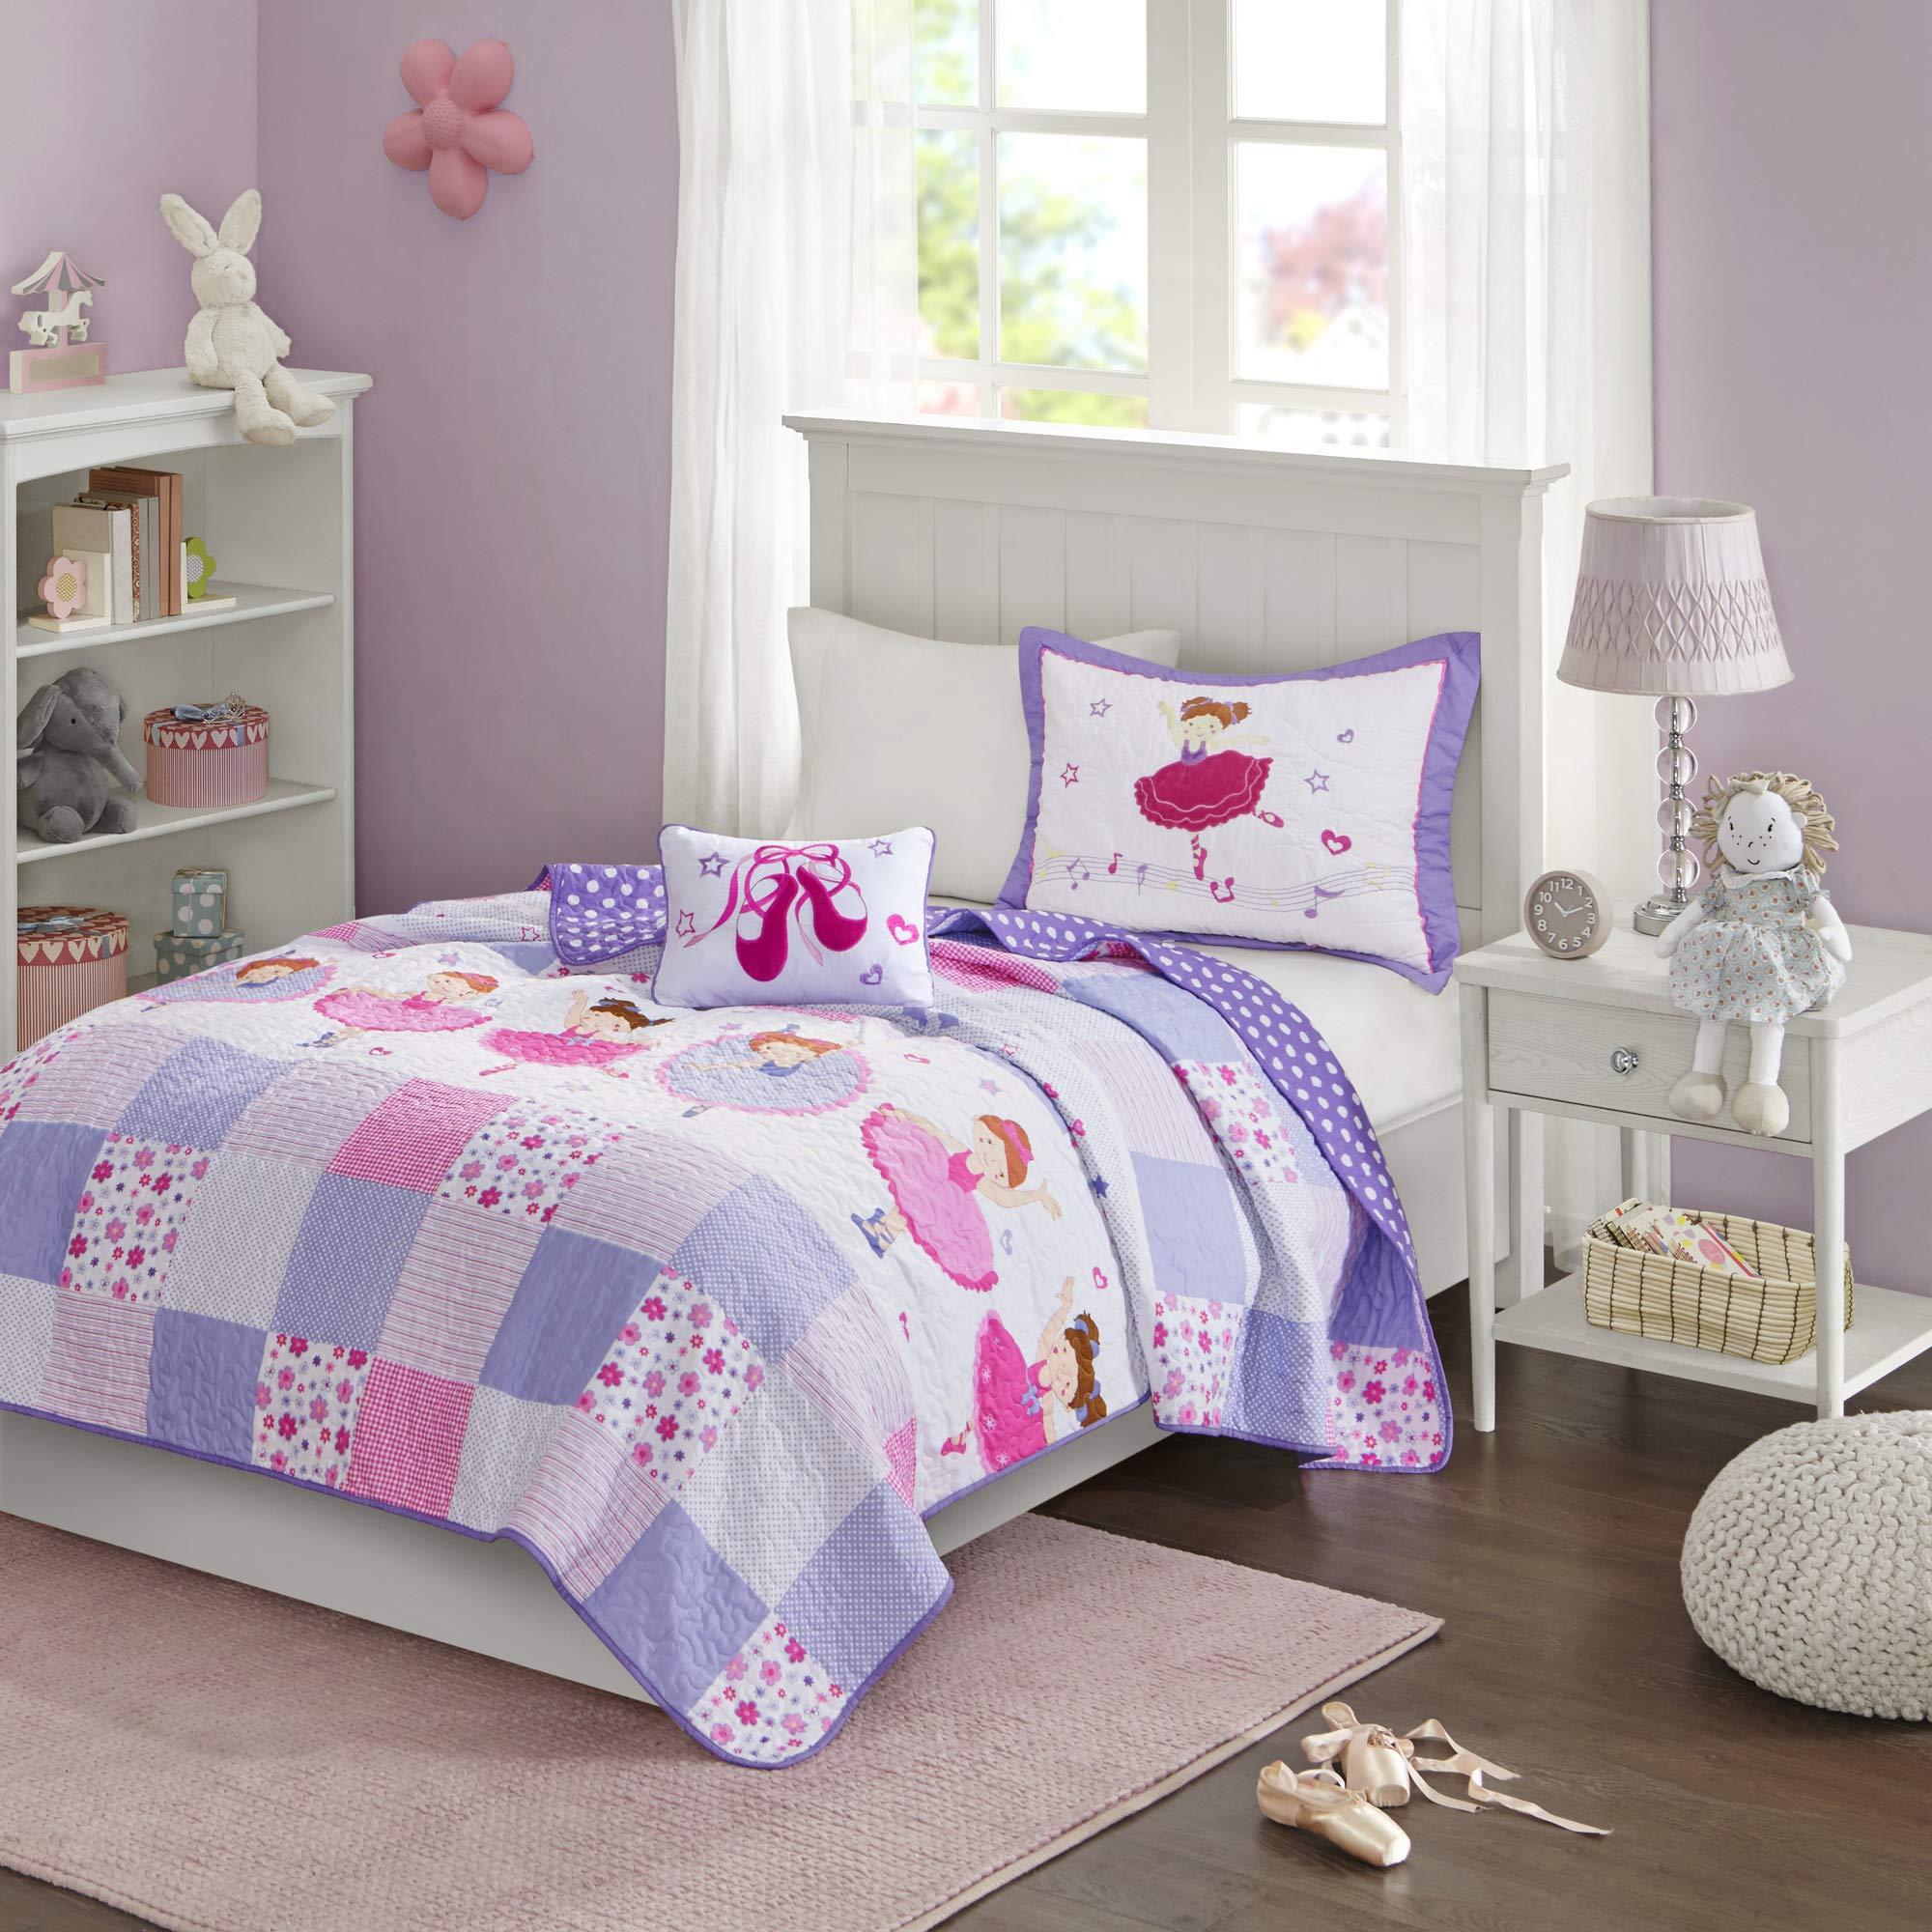 Mi Zone Kids Twirling Tutu Twin Bedding For Girls Quilt Set - Purple Pink , Princess - 3 Piece Kids Girls Quilts - Ultra Soft Microfiber Quilt Sets Coverlet by Mi-Zone